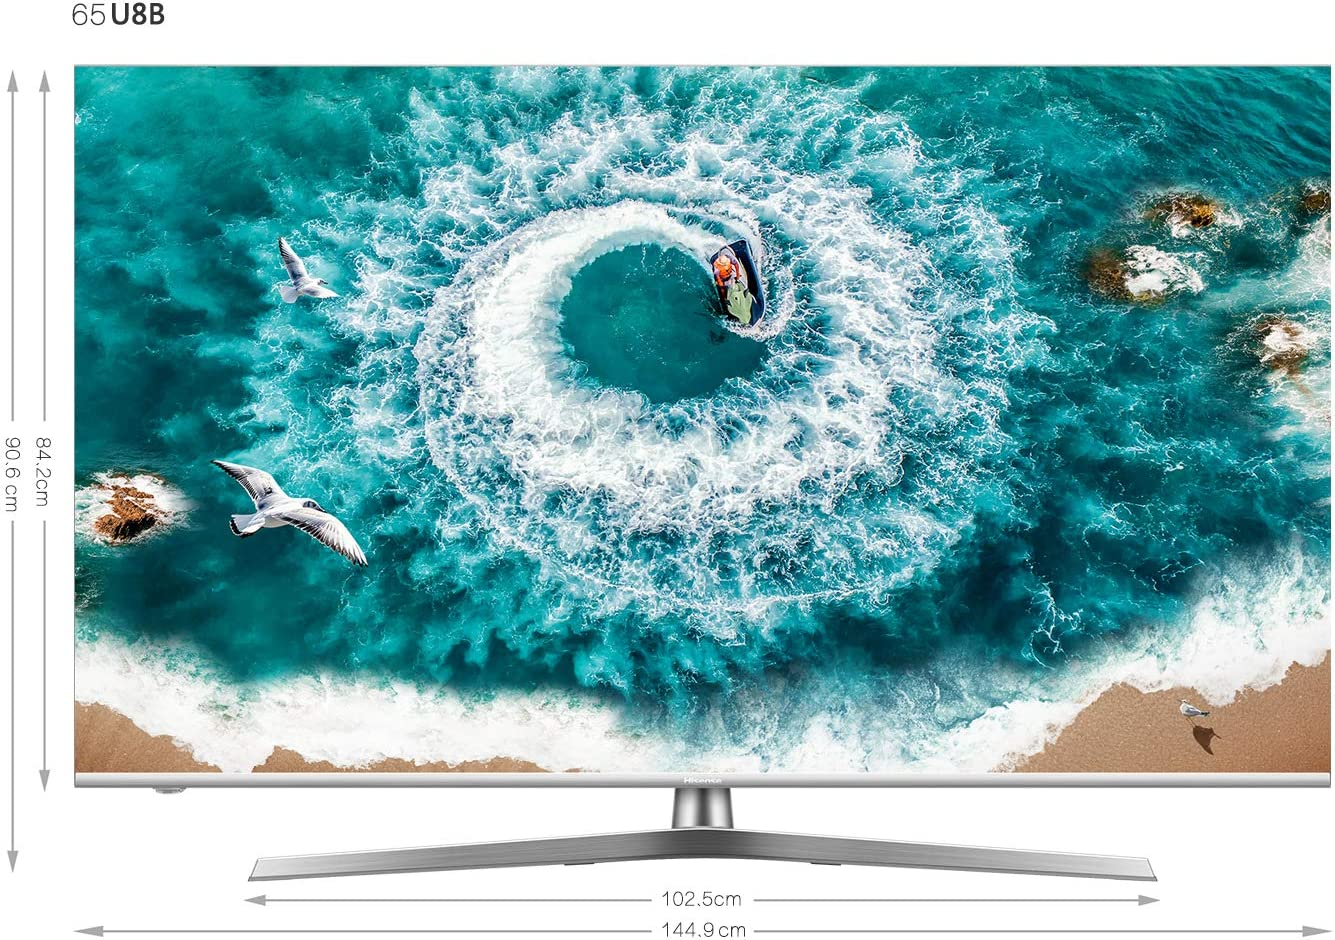 TELEVISOR 65 65U8B STV WiFi UHD ULED LOCALD SUBW HISENSE: Hisense ...